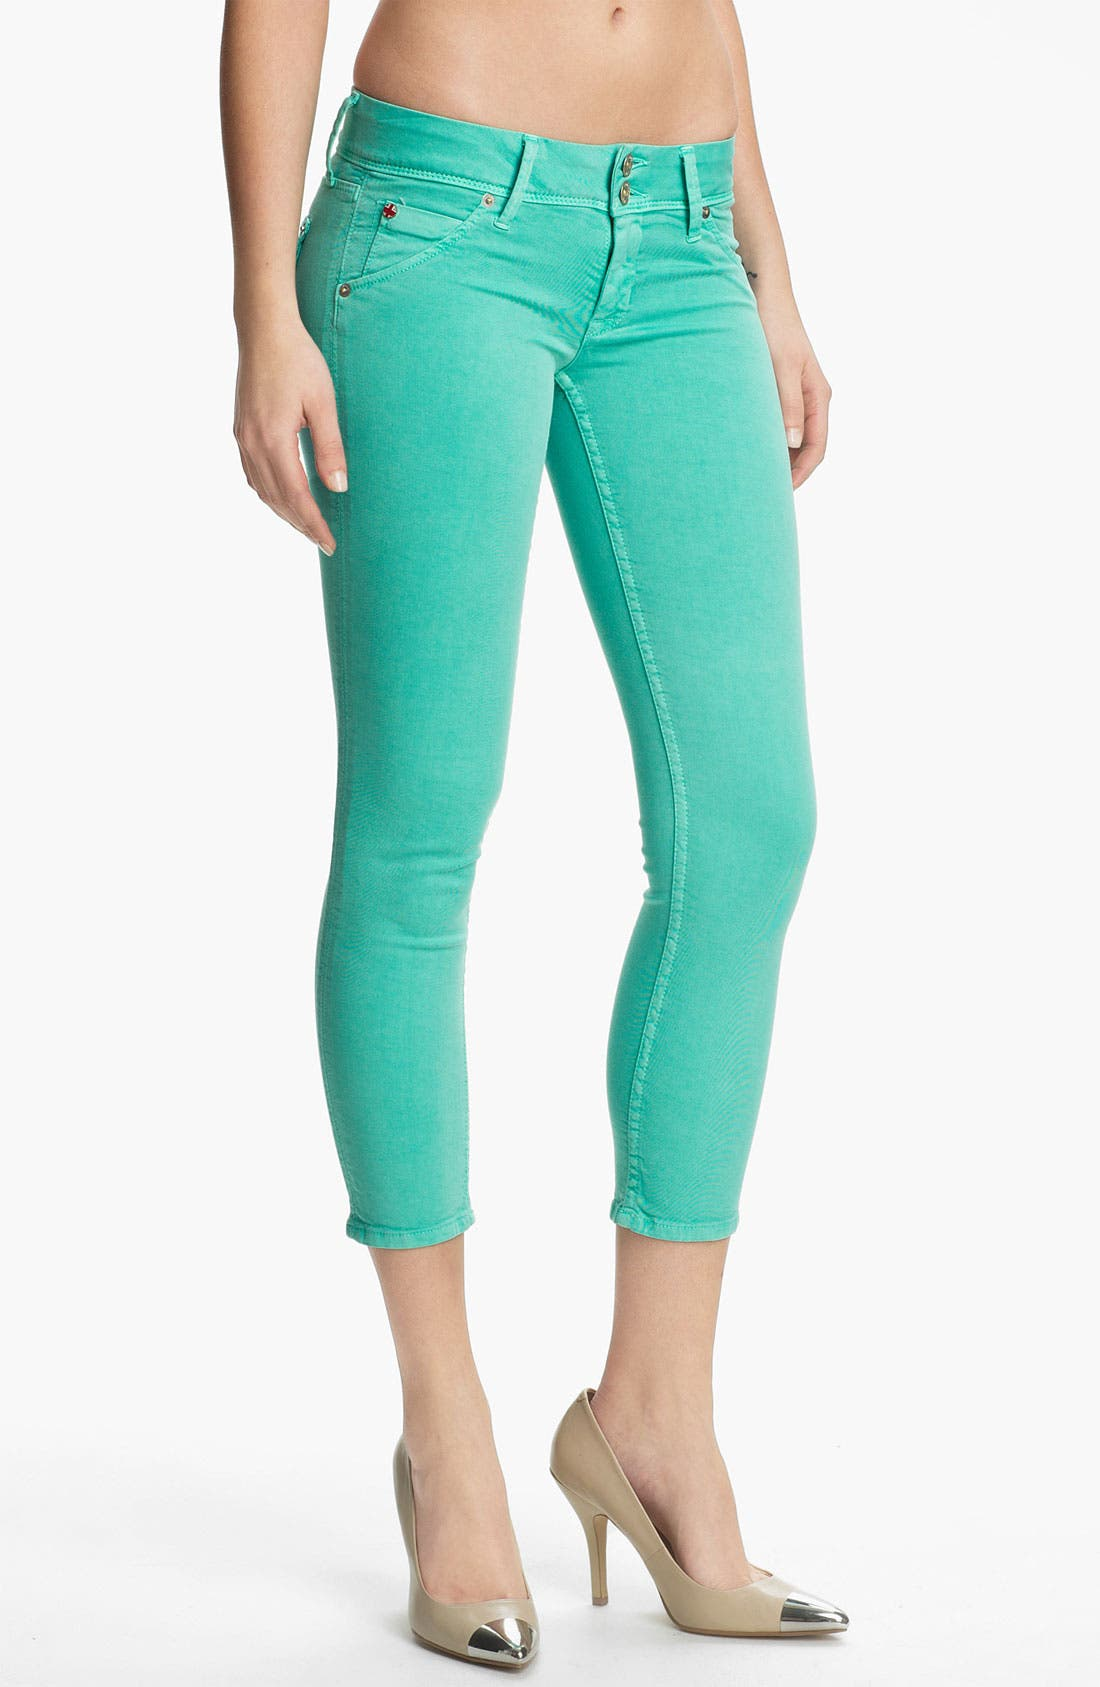 Alternate Image 1 Selected - Hudson Jeans 'Collin' Crop Skinny Jeans (Supernova)